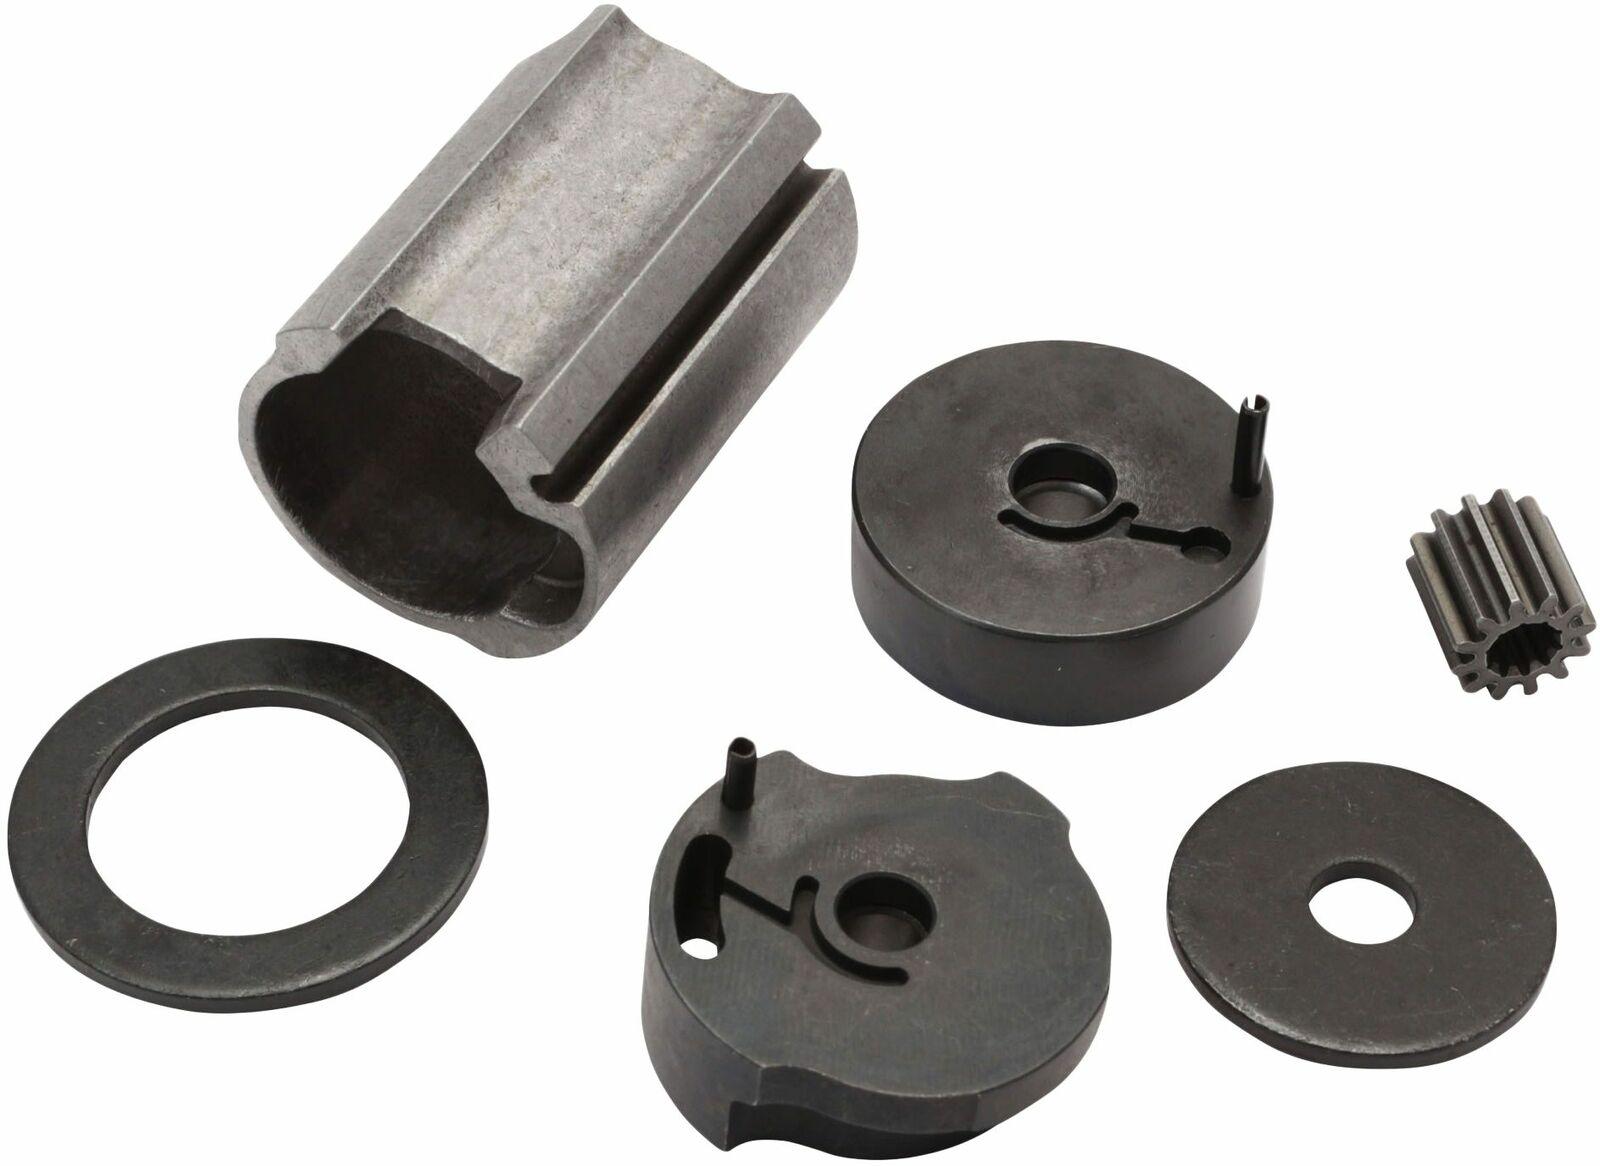 HAZET Cylinder unit 9022P-2-014 10